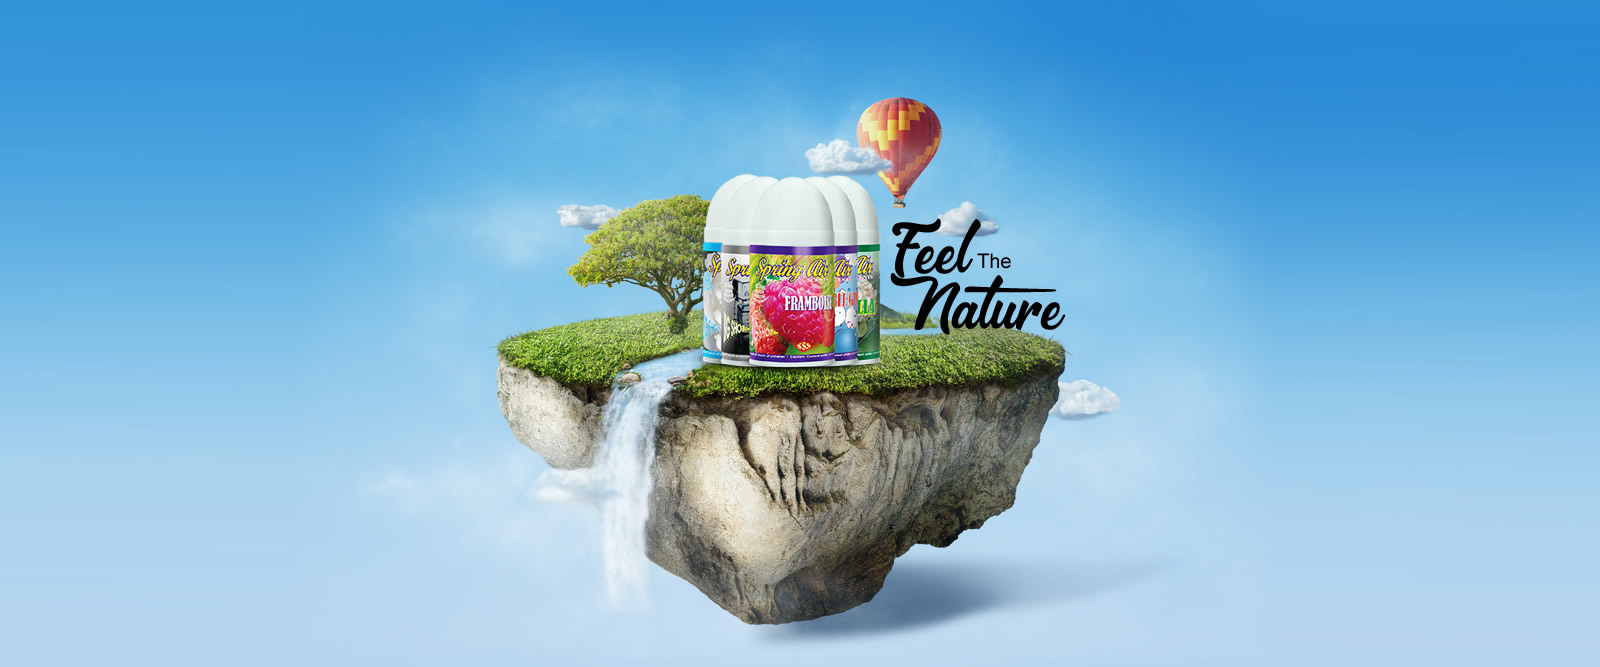 air fresheners for restaurants, air fresheners for homes, air fresheners for stores, air fresheners Lebanon, air fresheners Beirut, store scents Lebanon